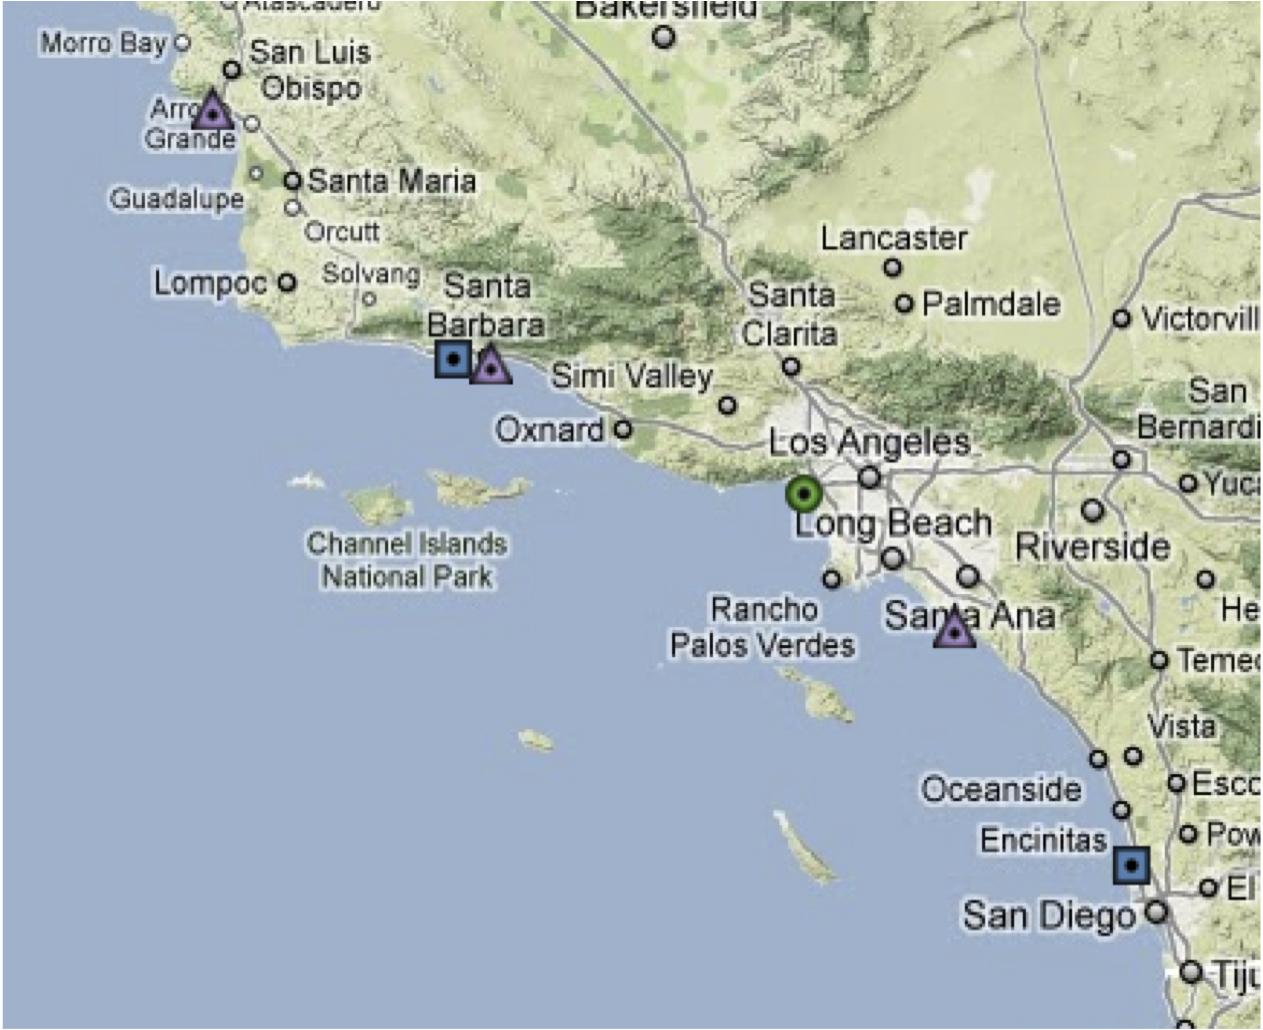 California Beach Cities Map - Klipy - Map Of Southern California Beach Cities